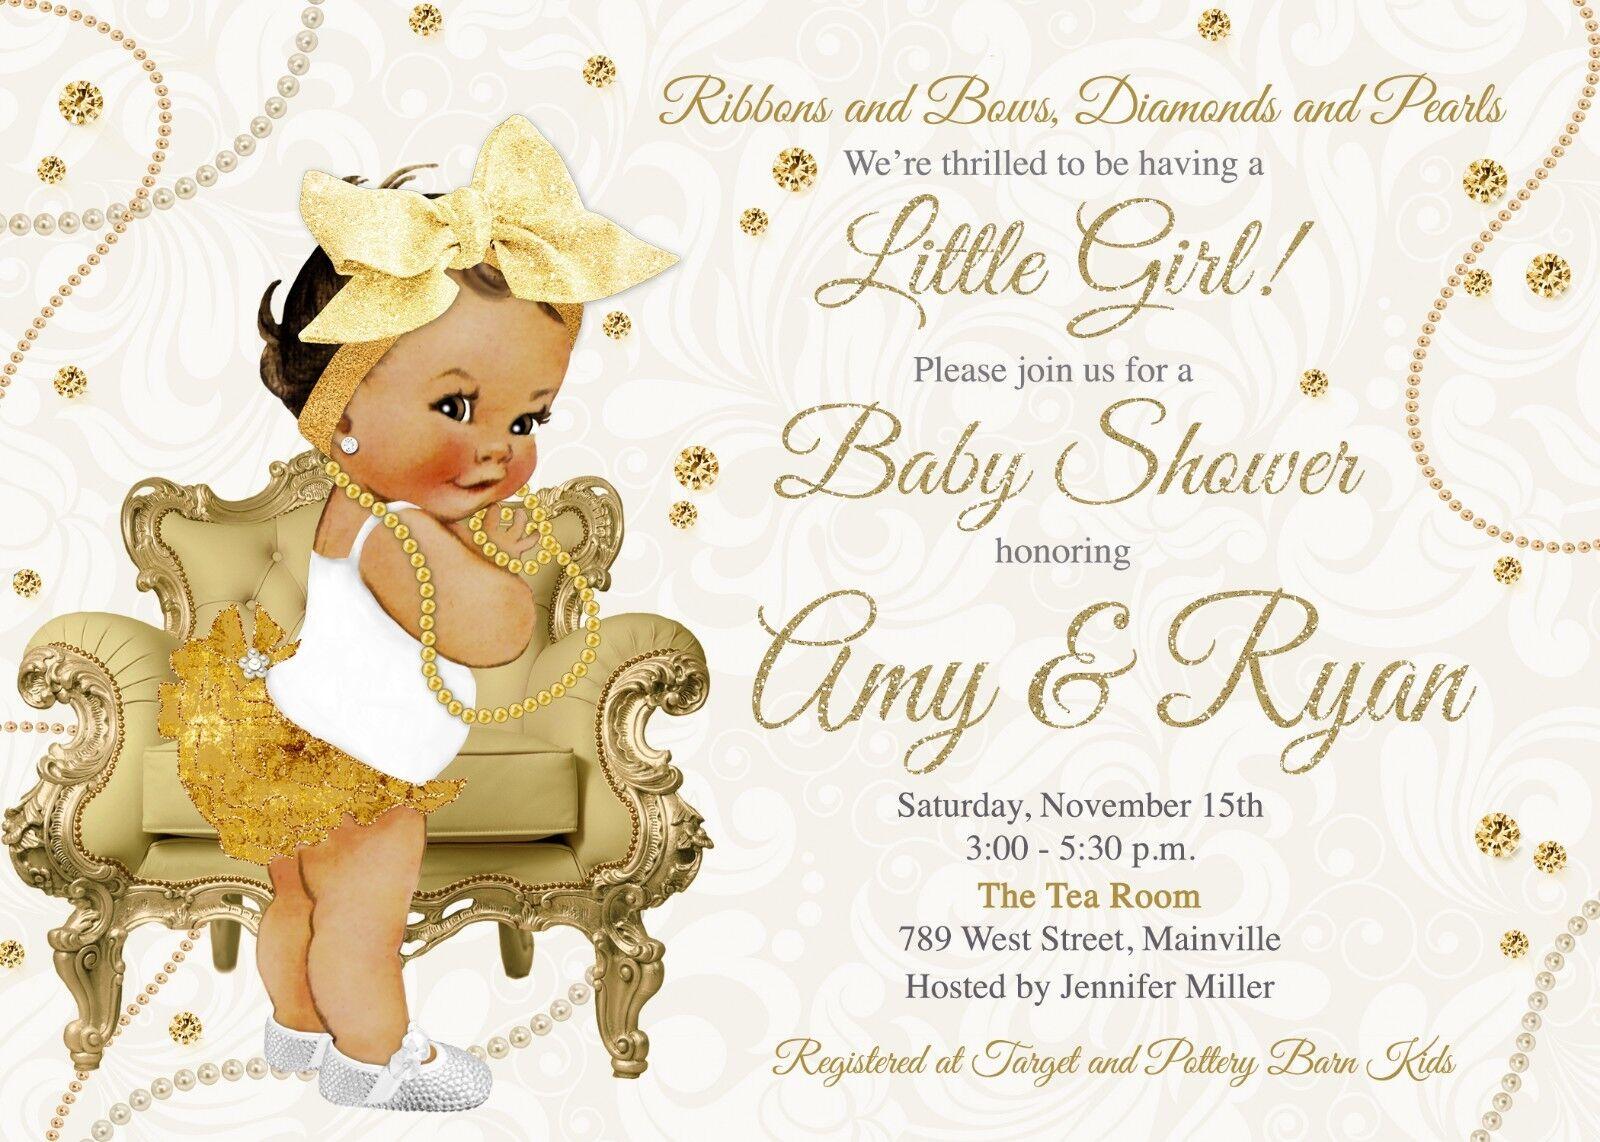 Diamonds Pearls Baby Shower, Girl, Girl, Girl, Baby Girl, Gold, Pearls, Diamonds, Invitation 4cd20d